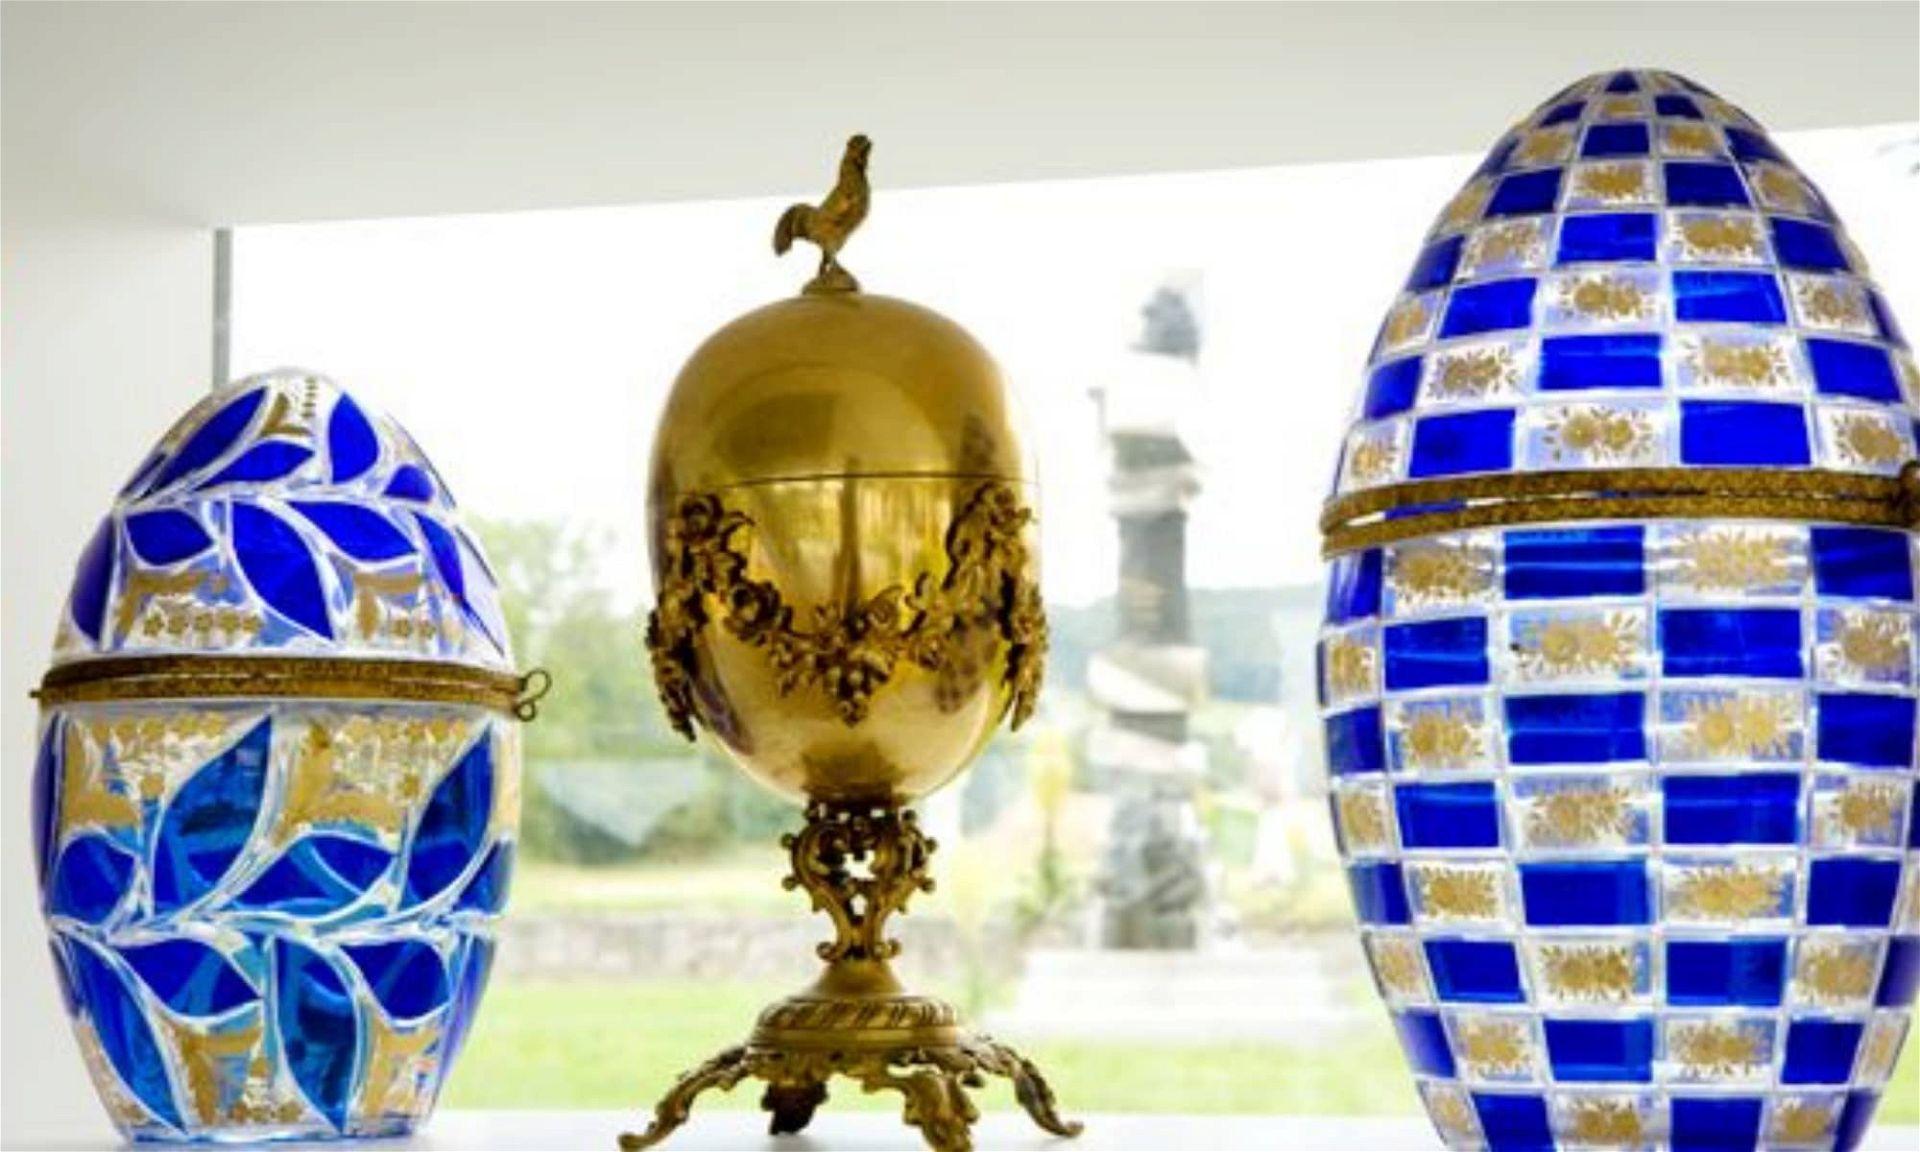 Eiermuseum: Burgenland